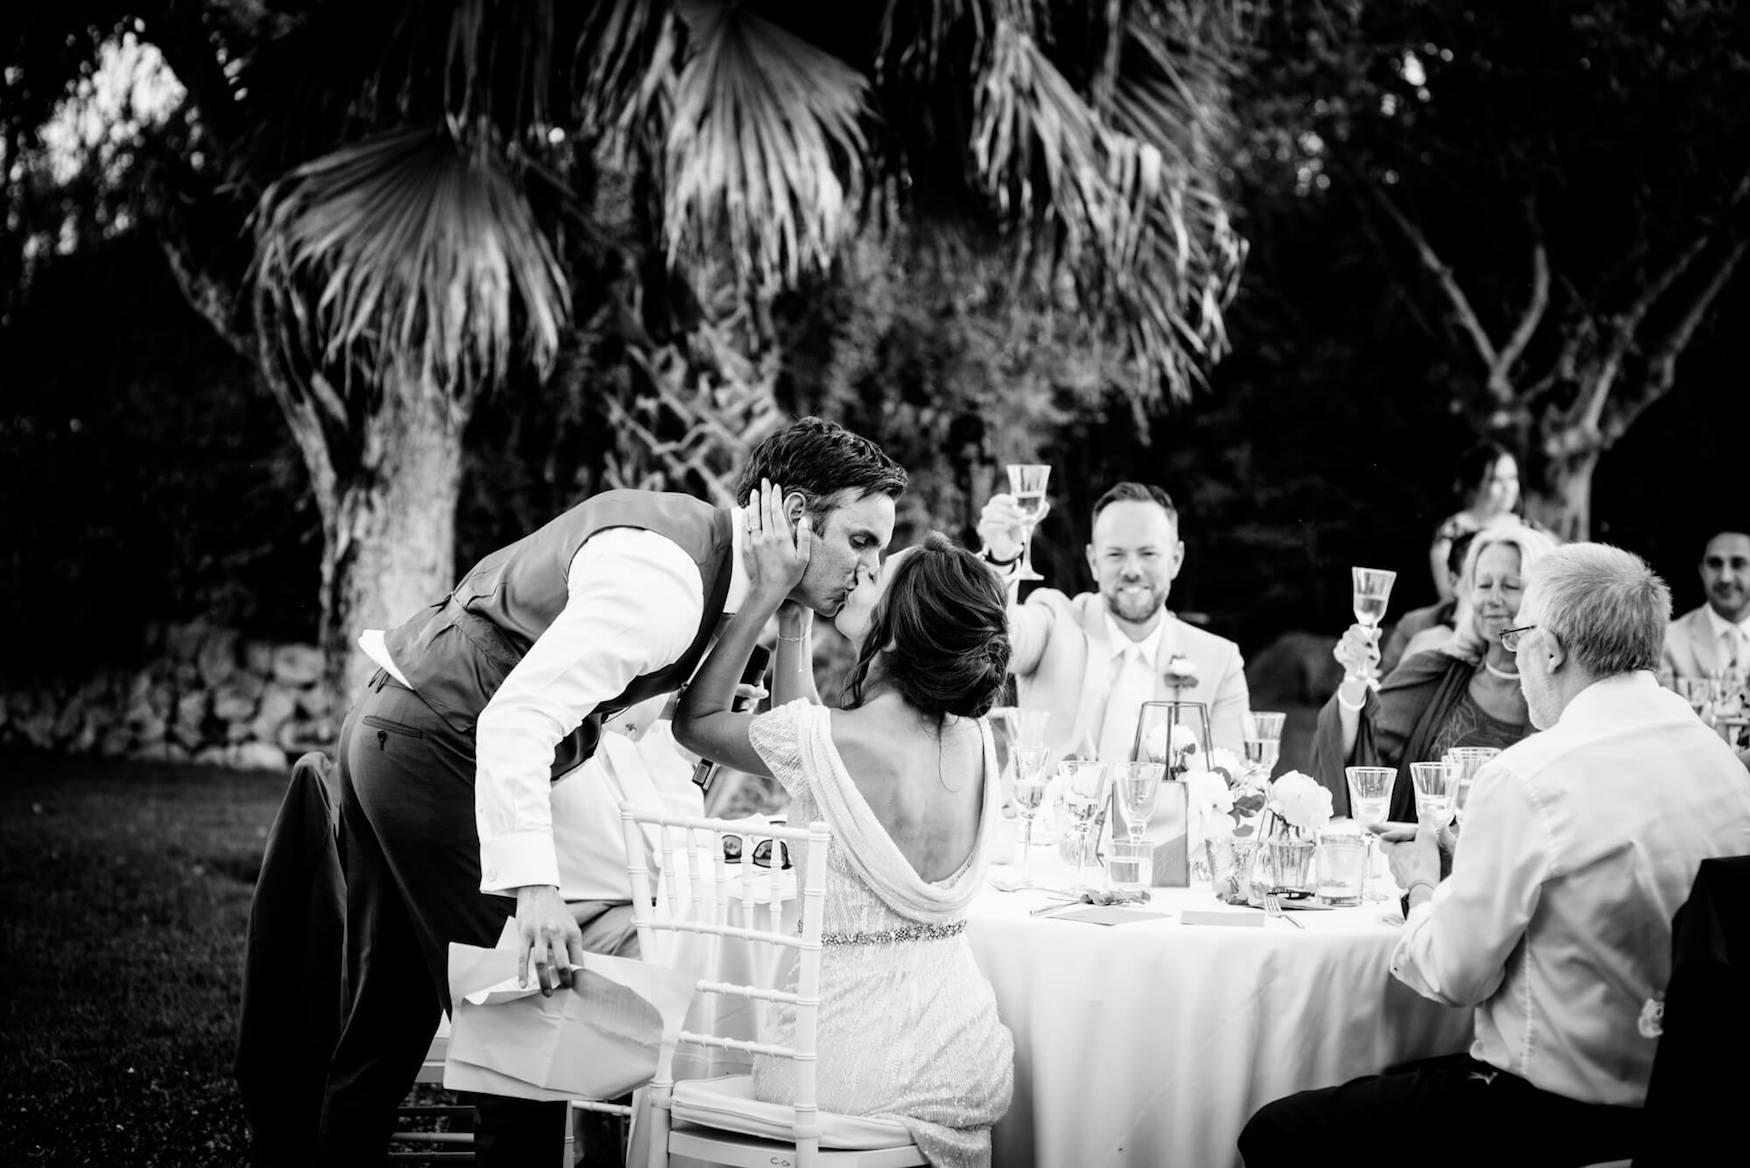 groom bride wedding speeches outdoor dinner cheers champagne